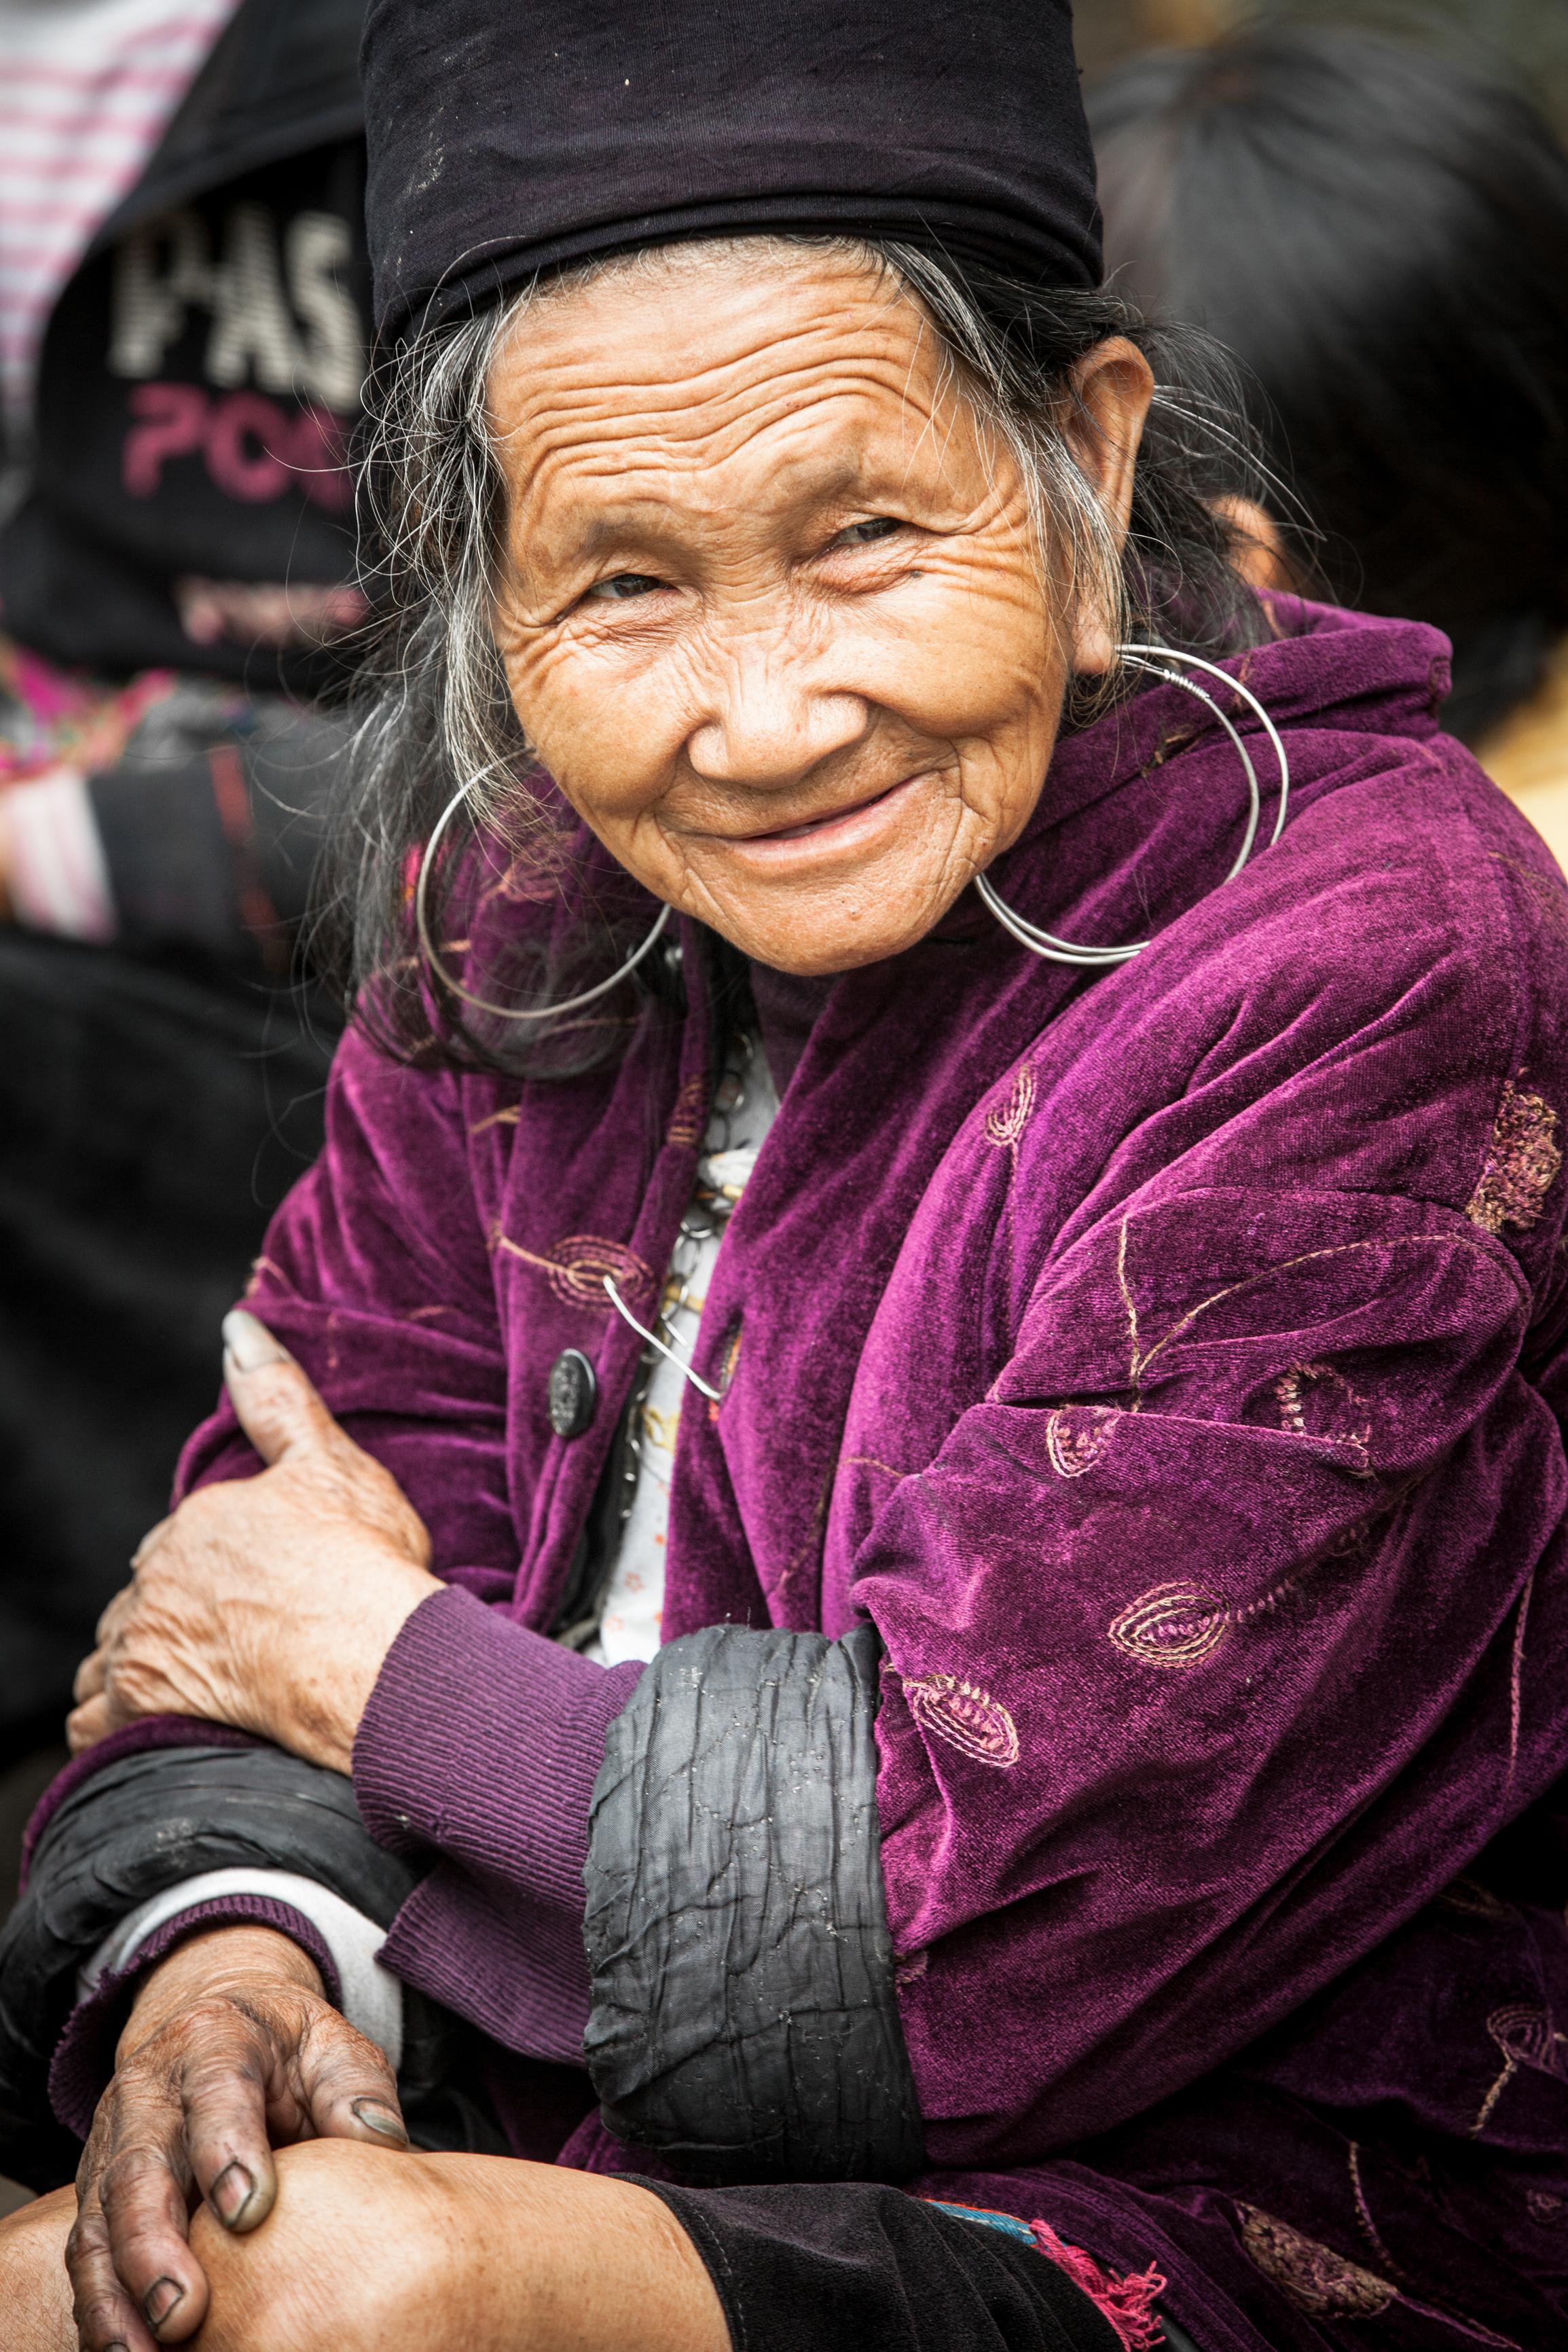 Photo: Black Hmong Woman in Vietnam © Eermakova   Dreamstime.com